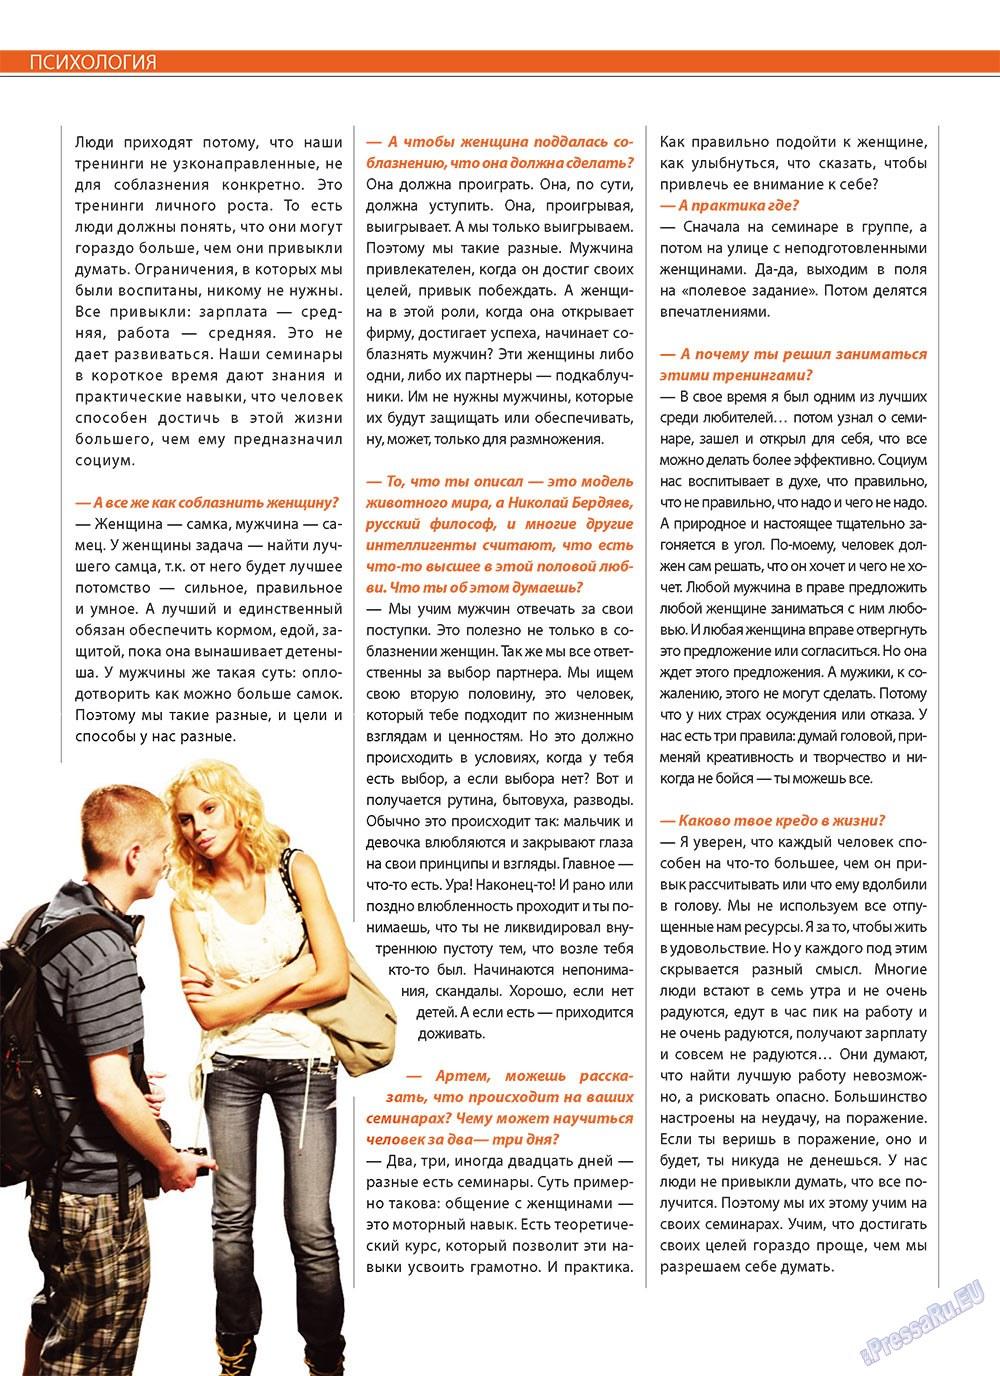 Артек (журнал). 2010 год, номер 2, стр. 22